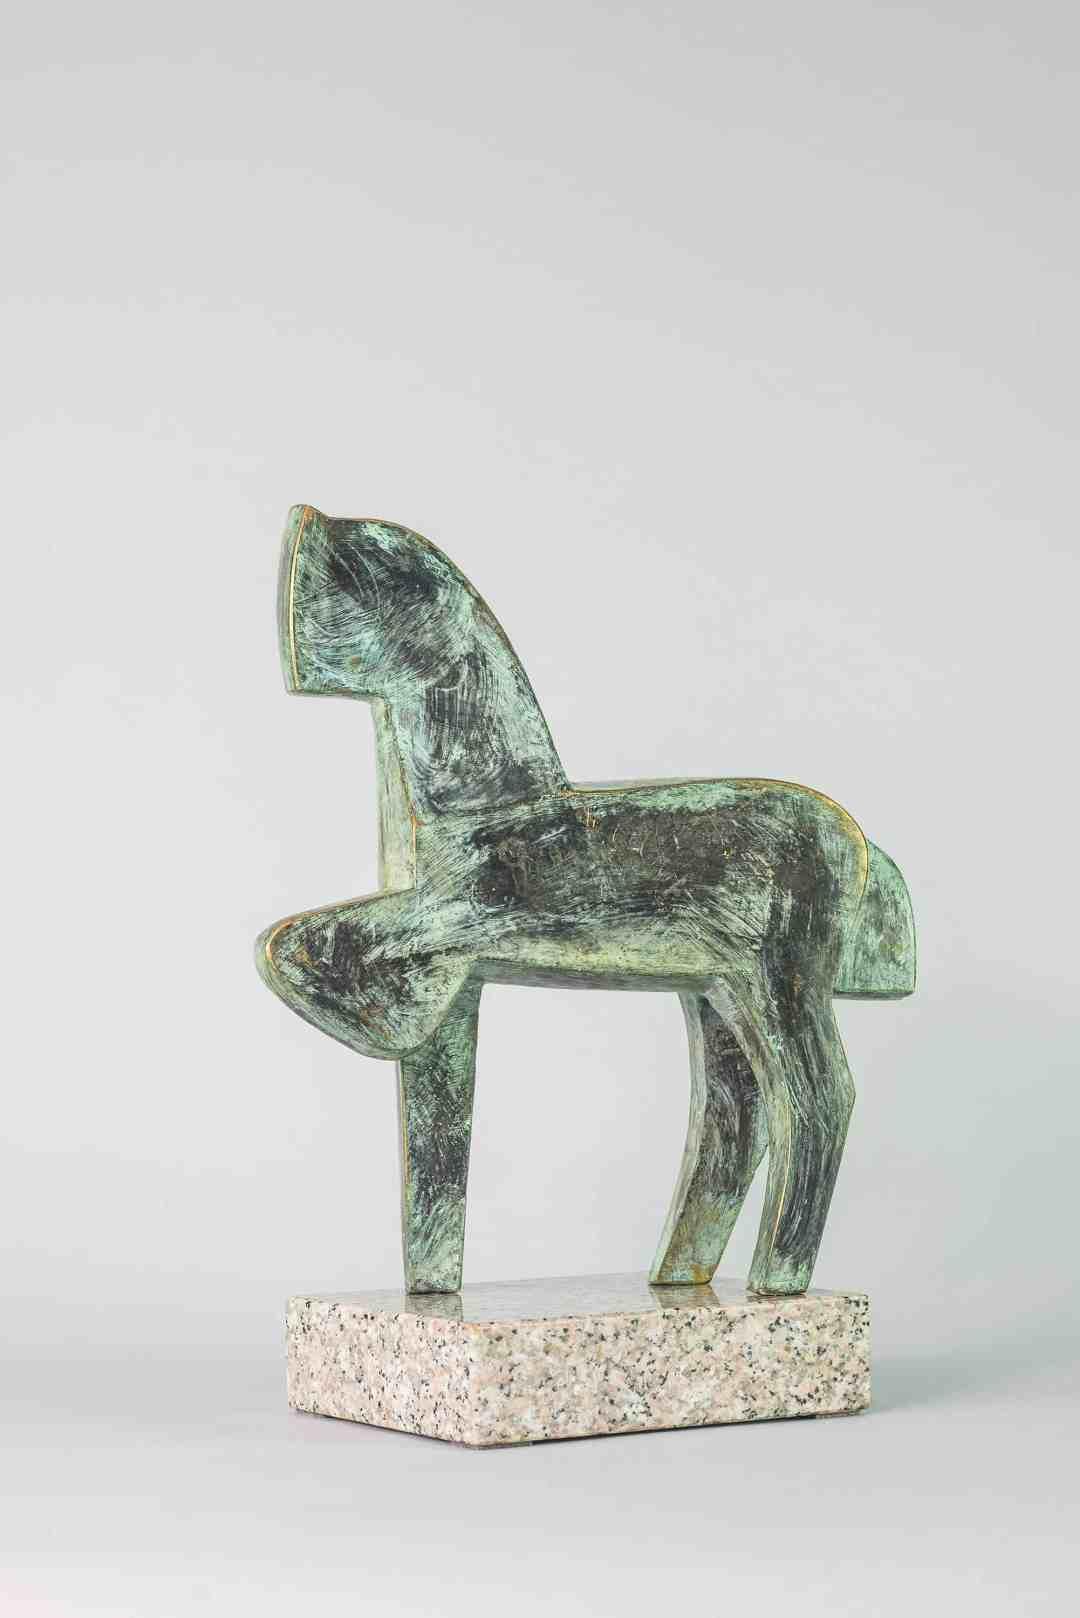 Roman Solski (b.1957 Łódź), Cubist horse, bronze, granite, 40,5 x 20 x 17 cm